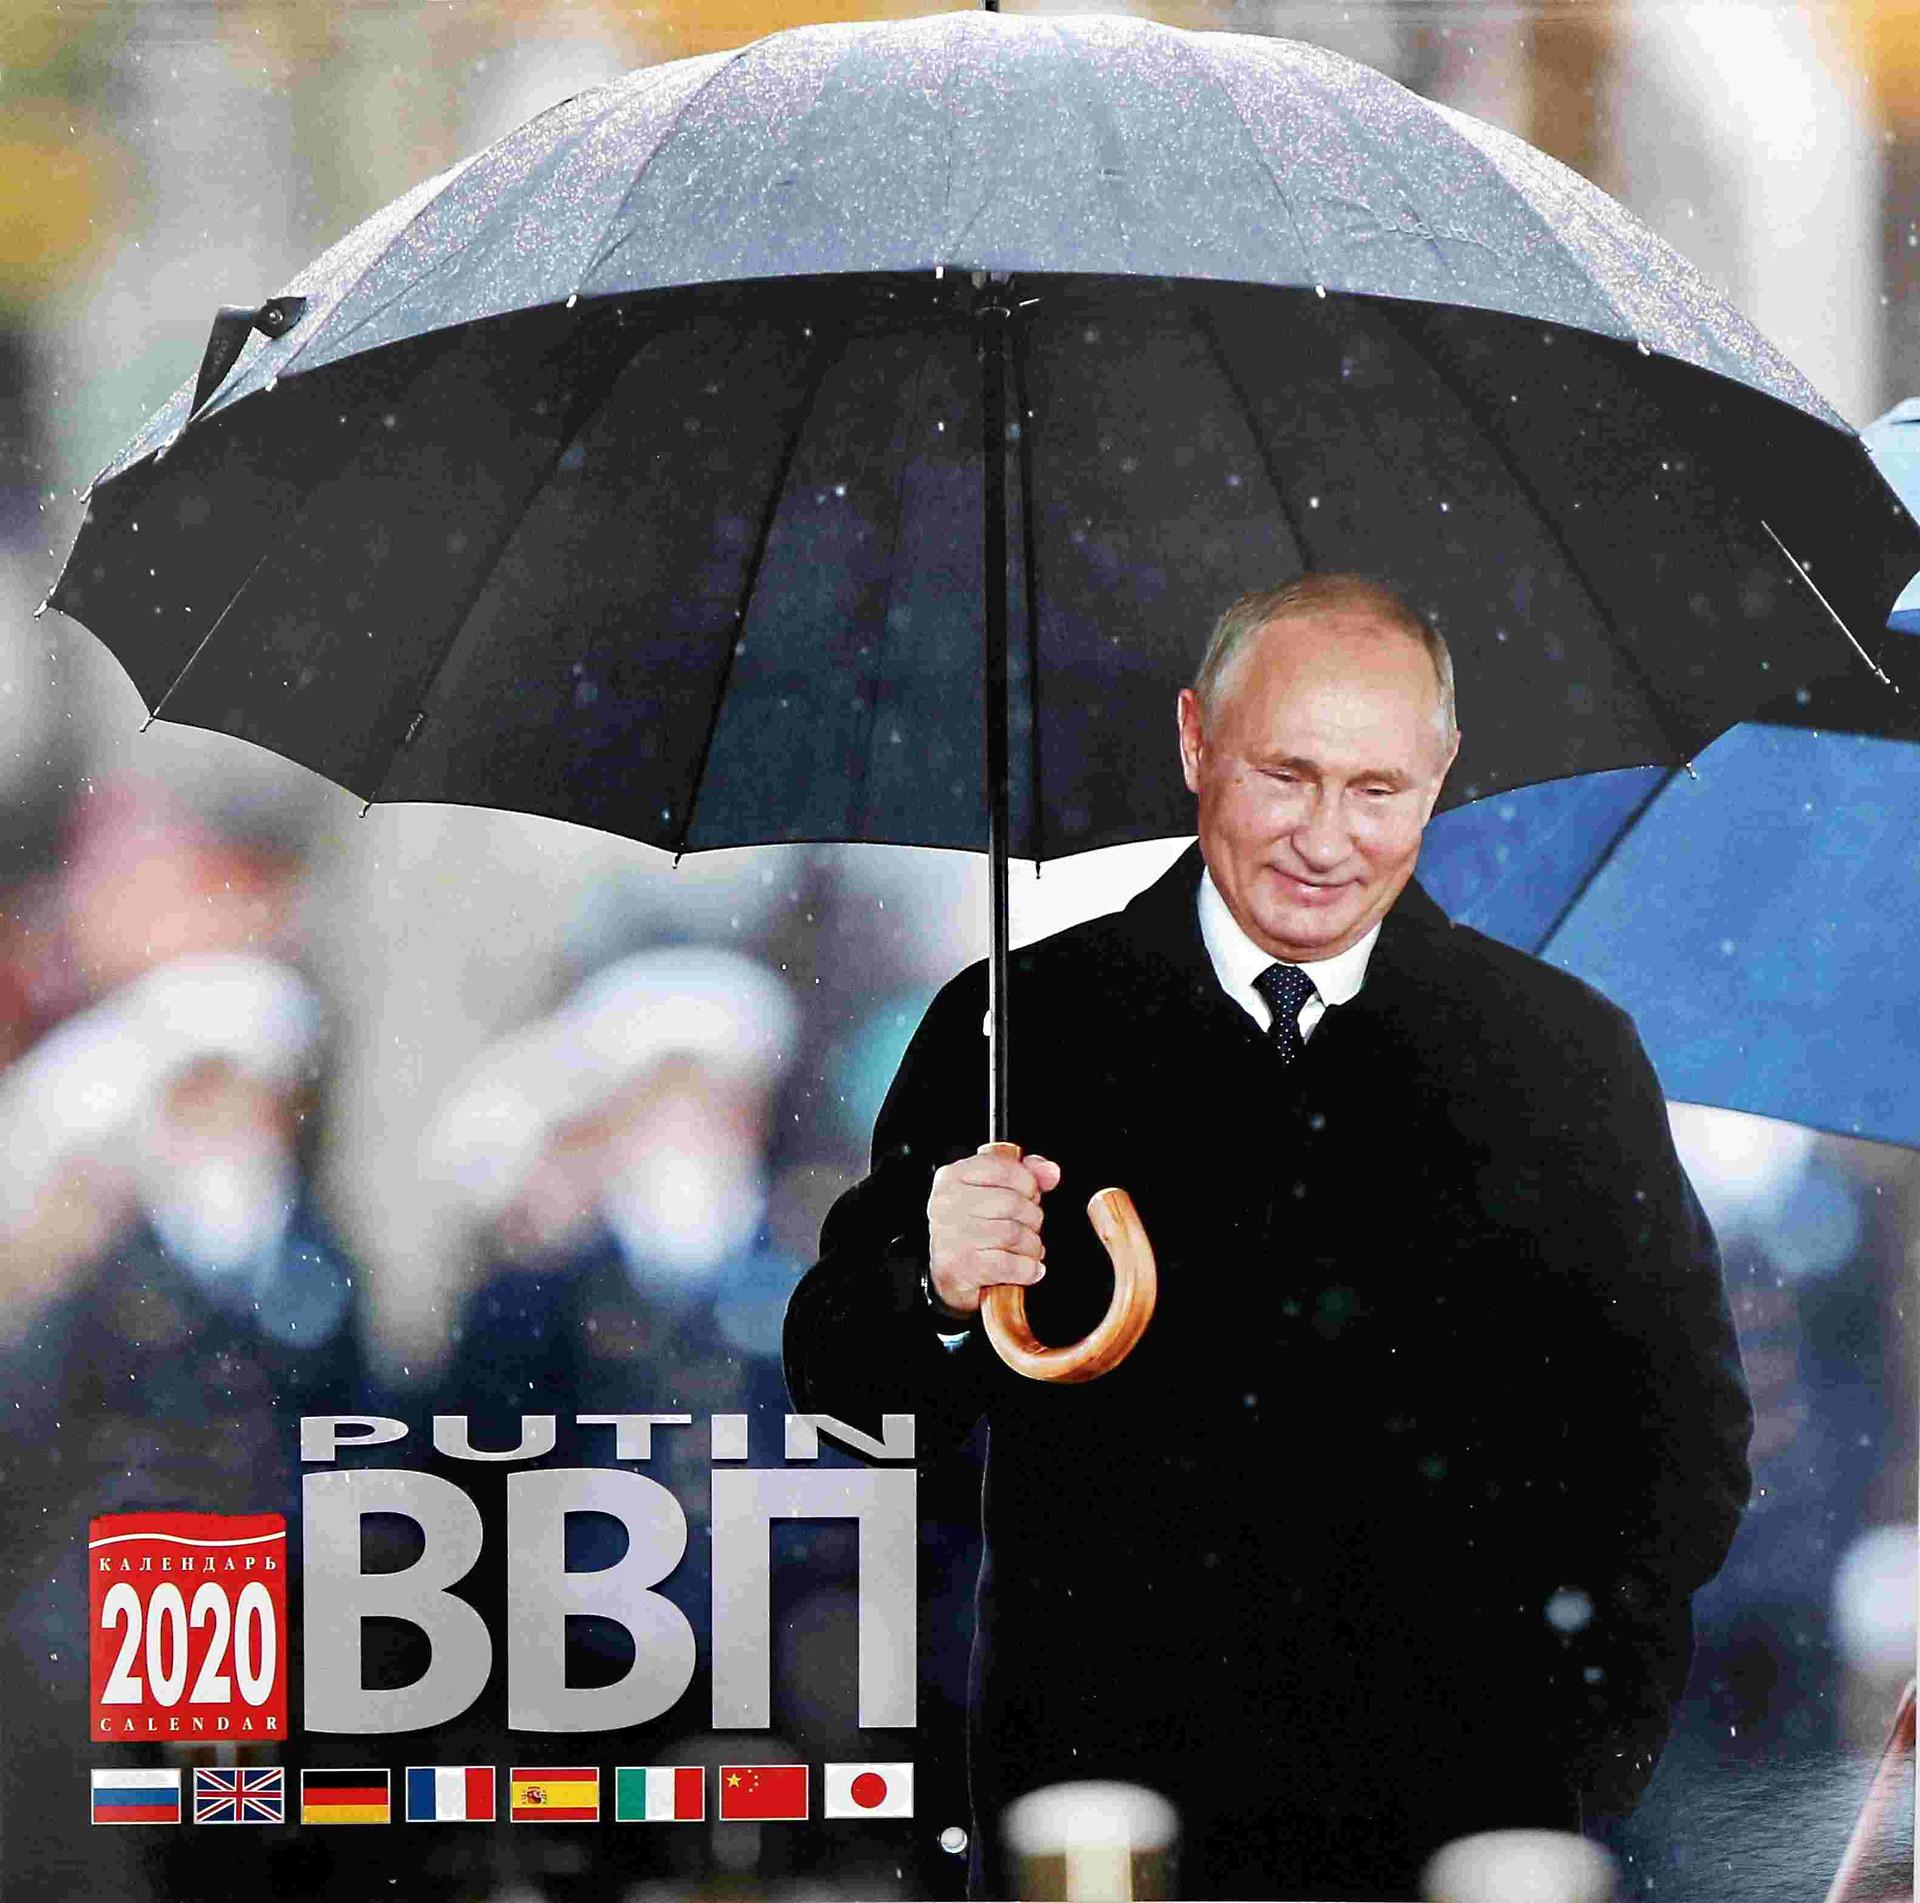 Putin 2020 Calendar with Umbrella